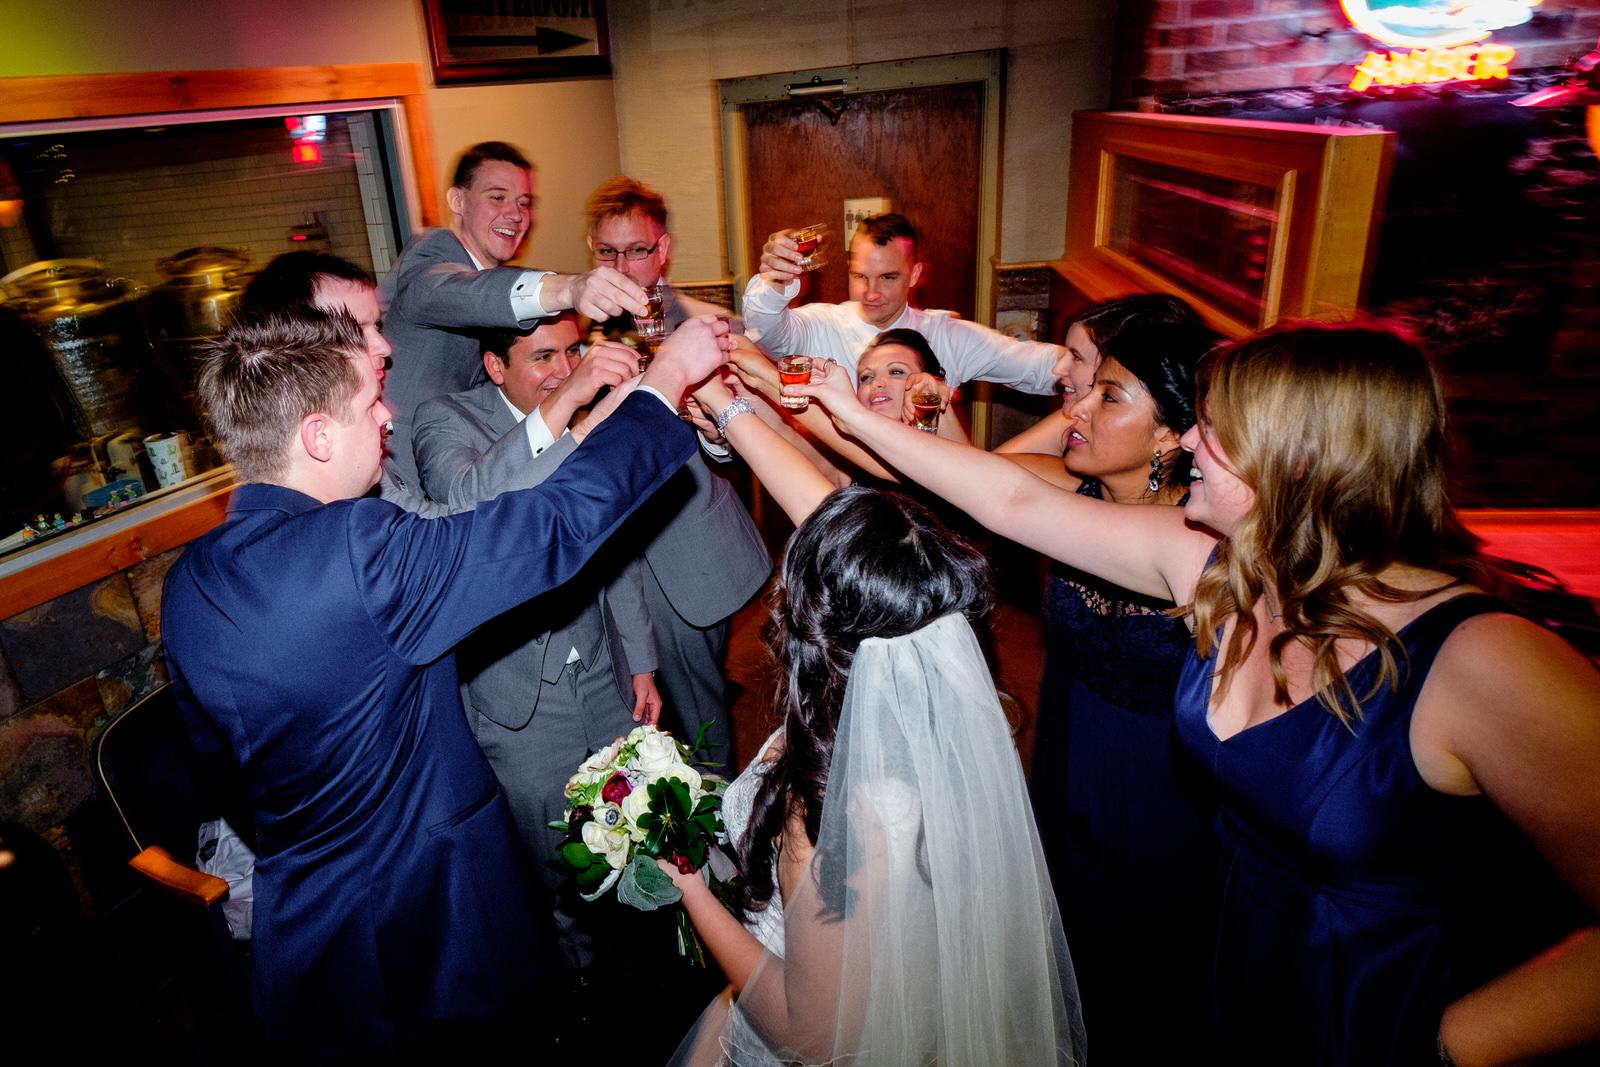 wedding party at gunflint tavern in grand marais